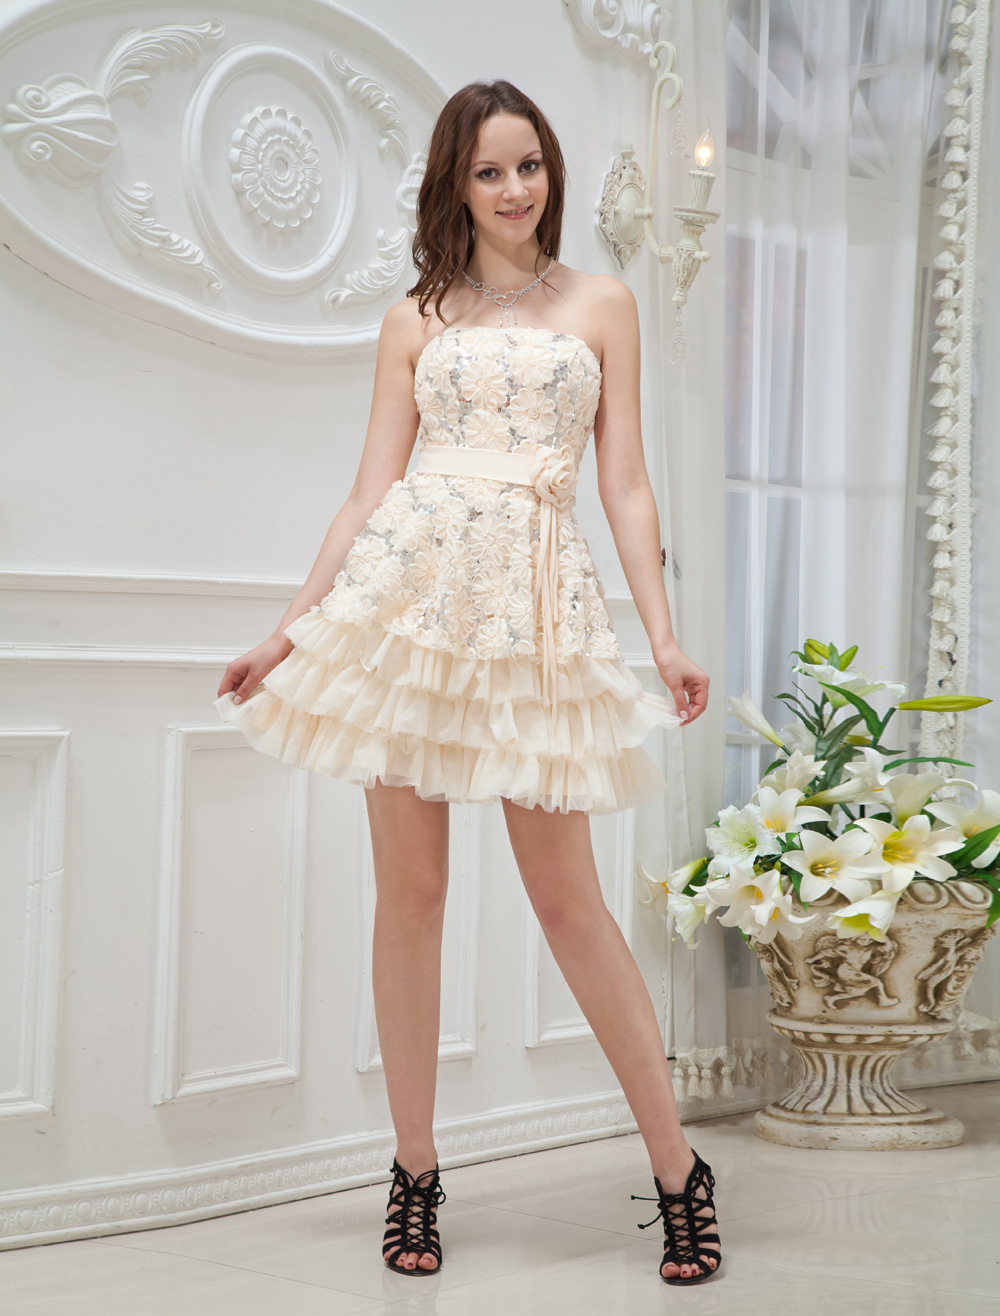 Strapless Knee Length Prom Dress (Wedding Cheap Party Dress) photo